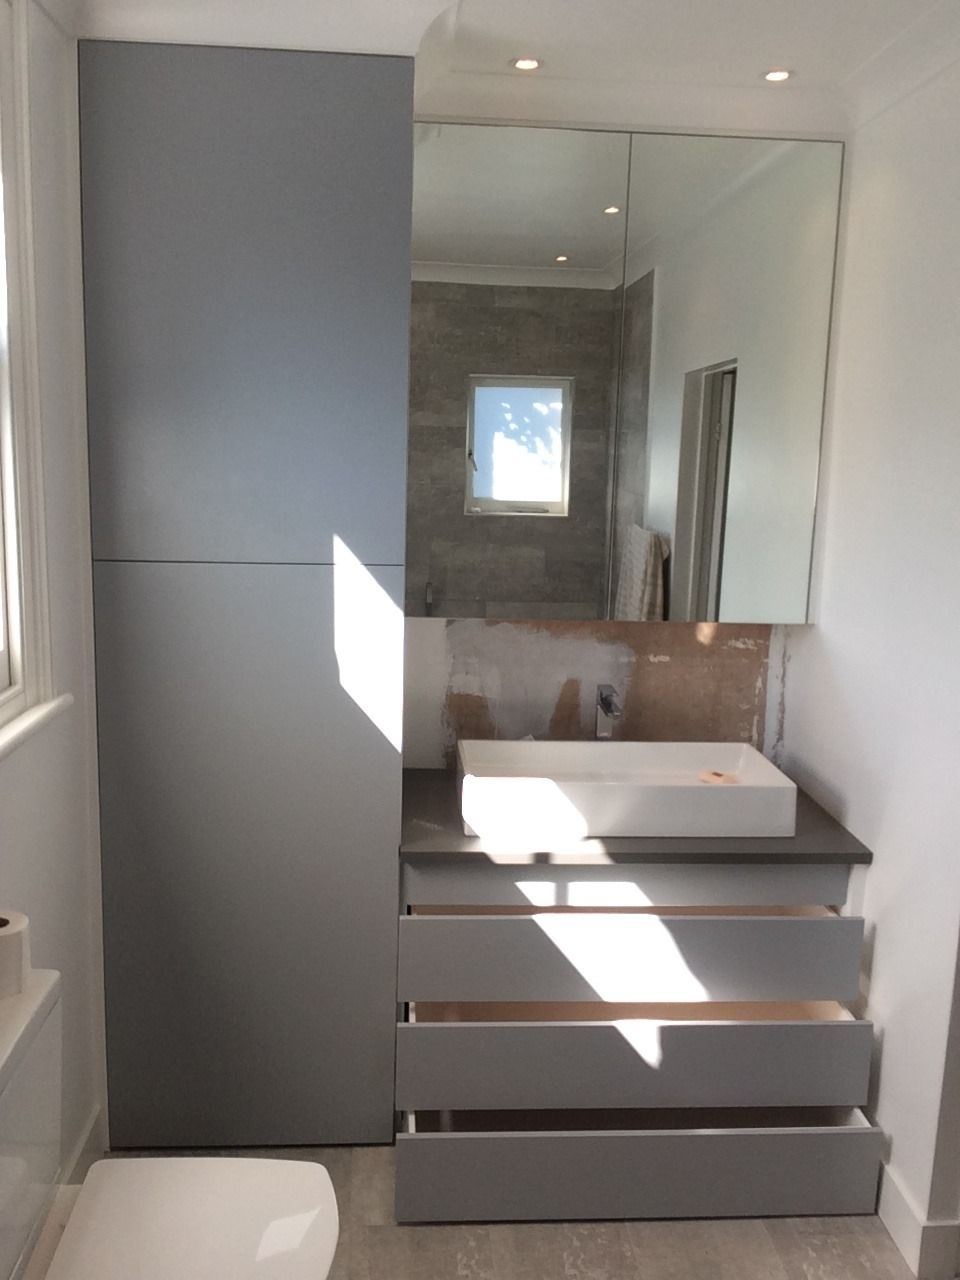 Handmade bathroom storage